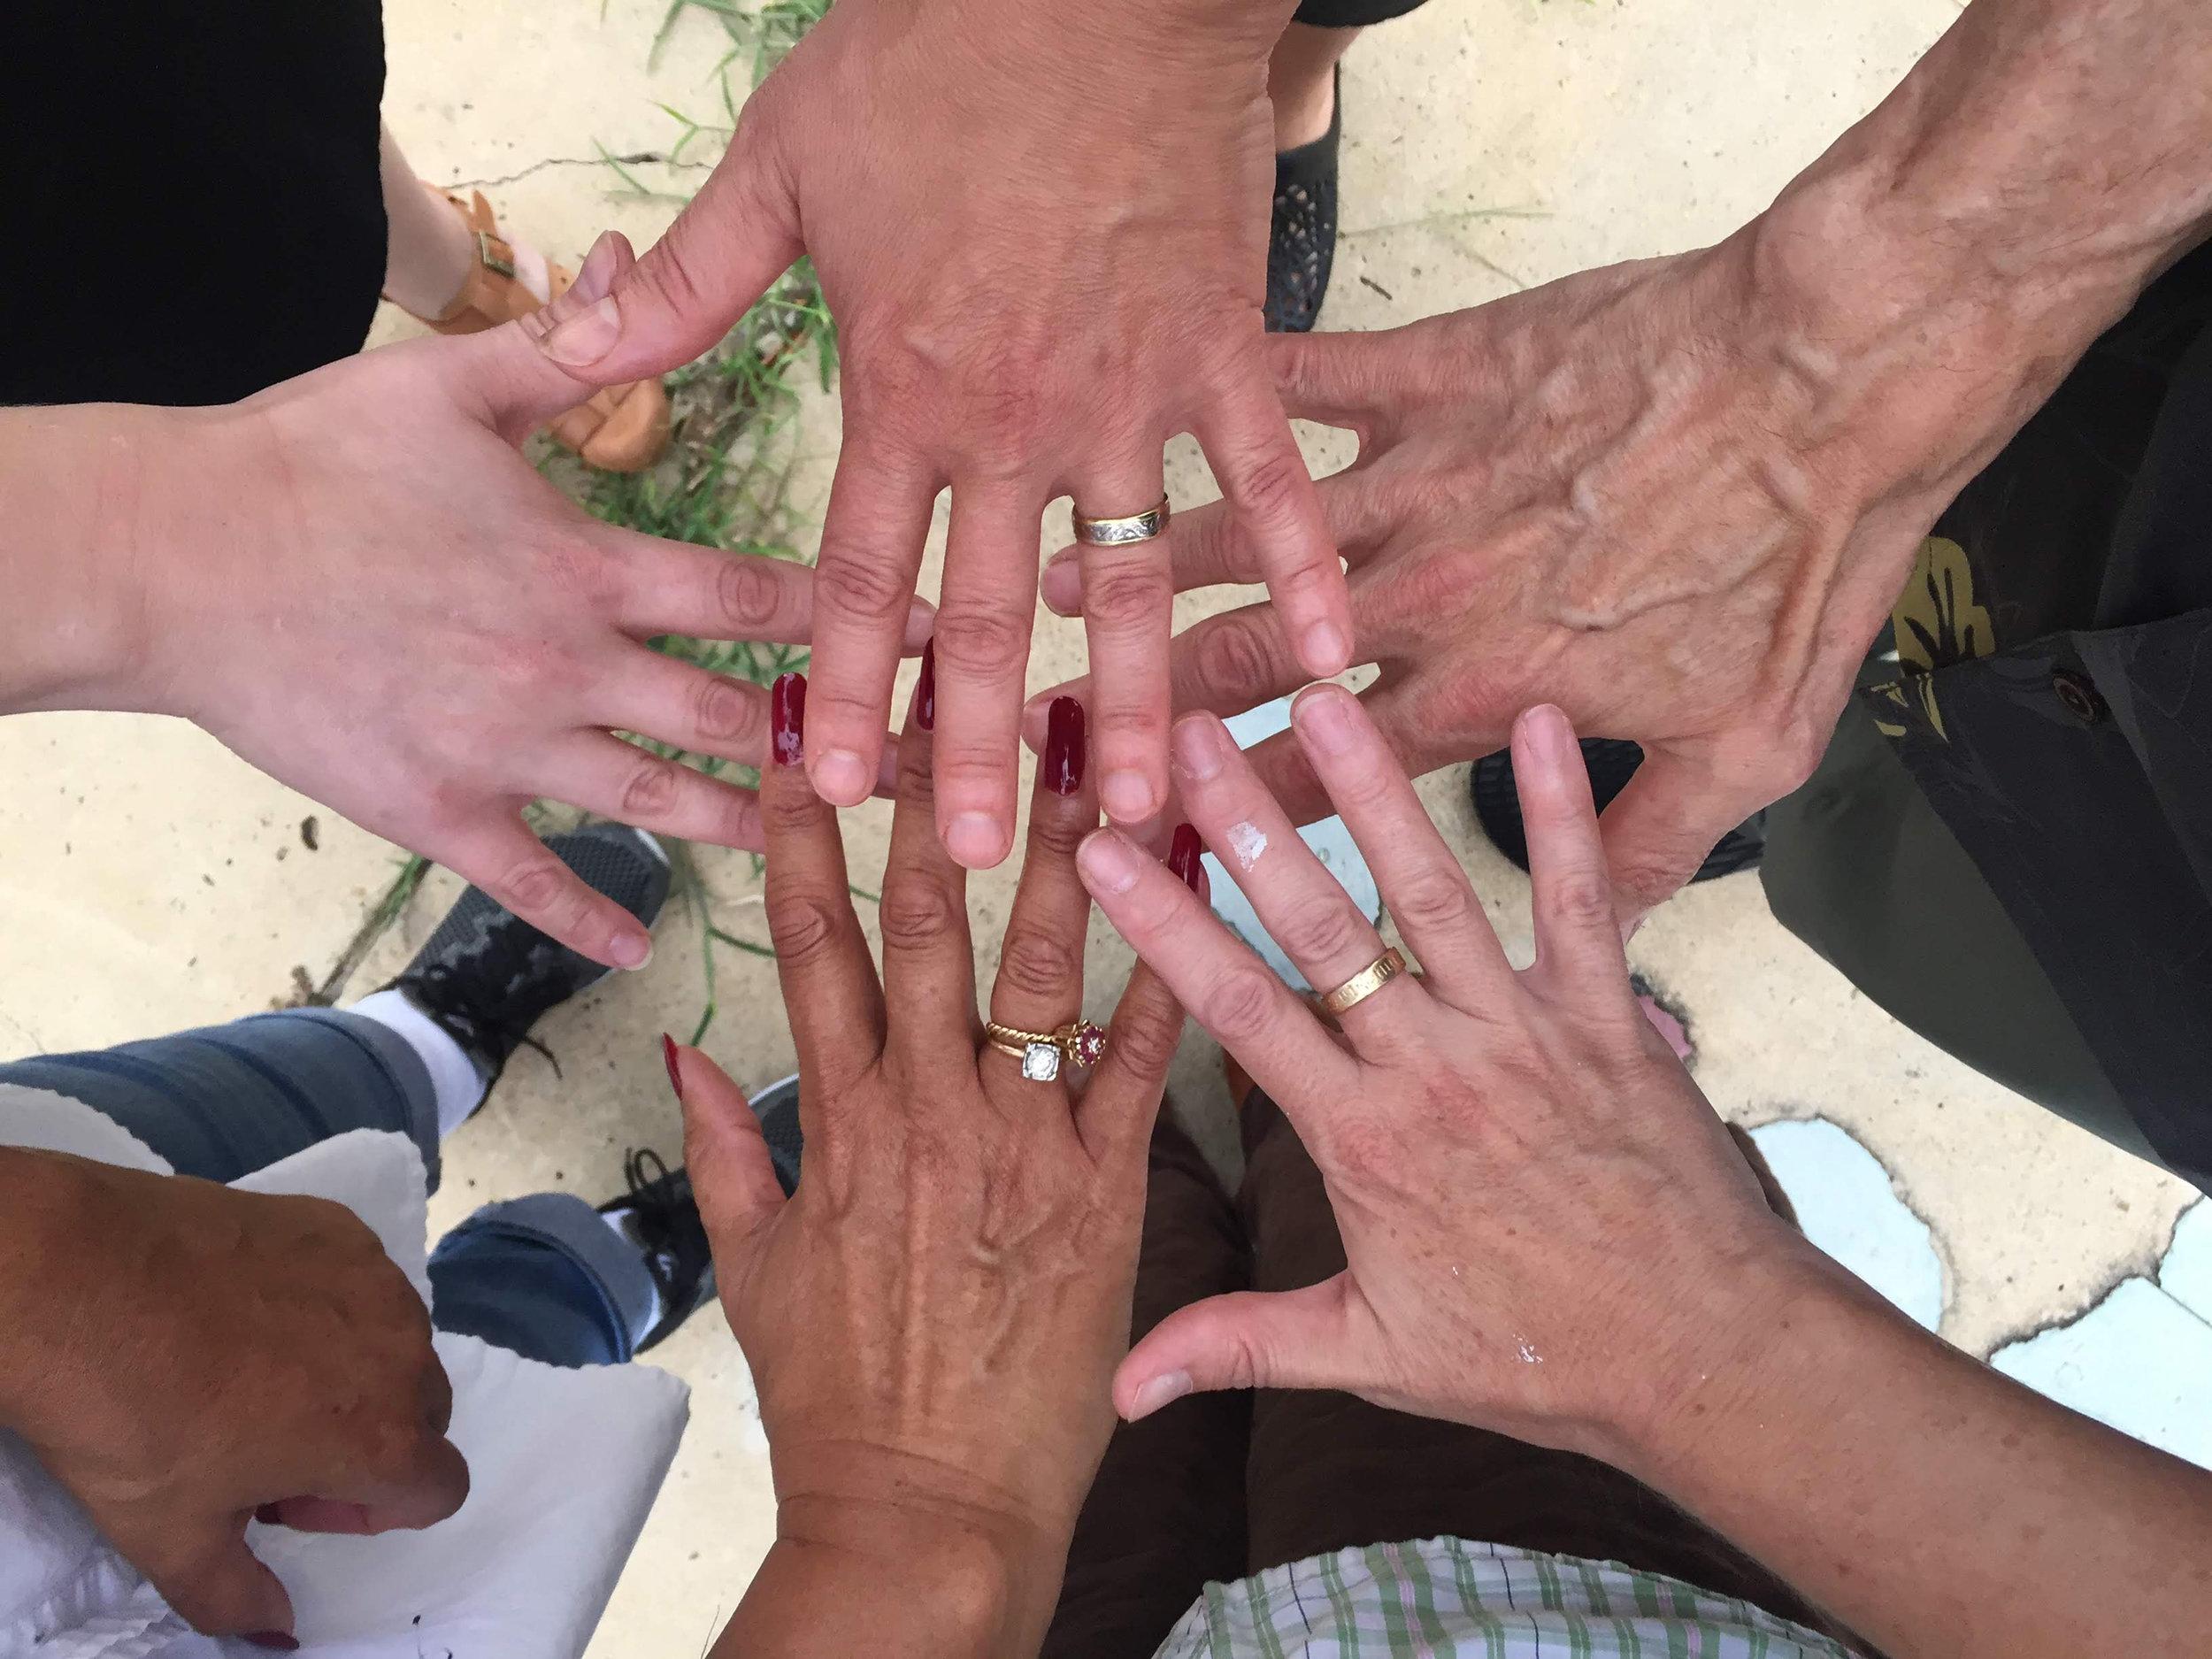 Tuscaloosa_2018_hands.jpg